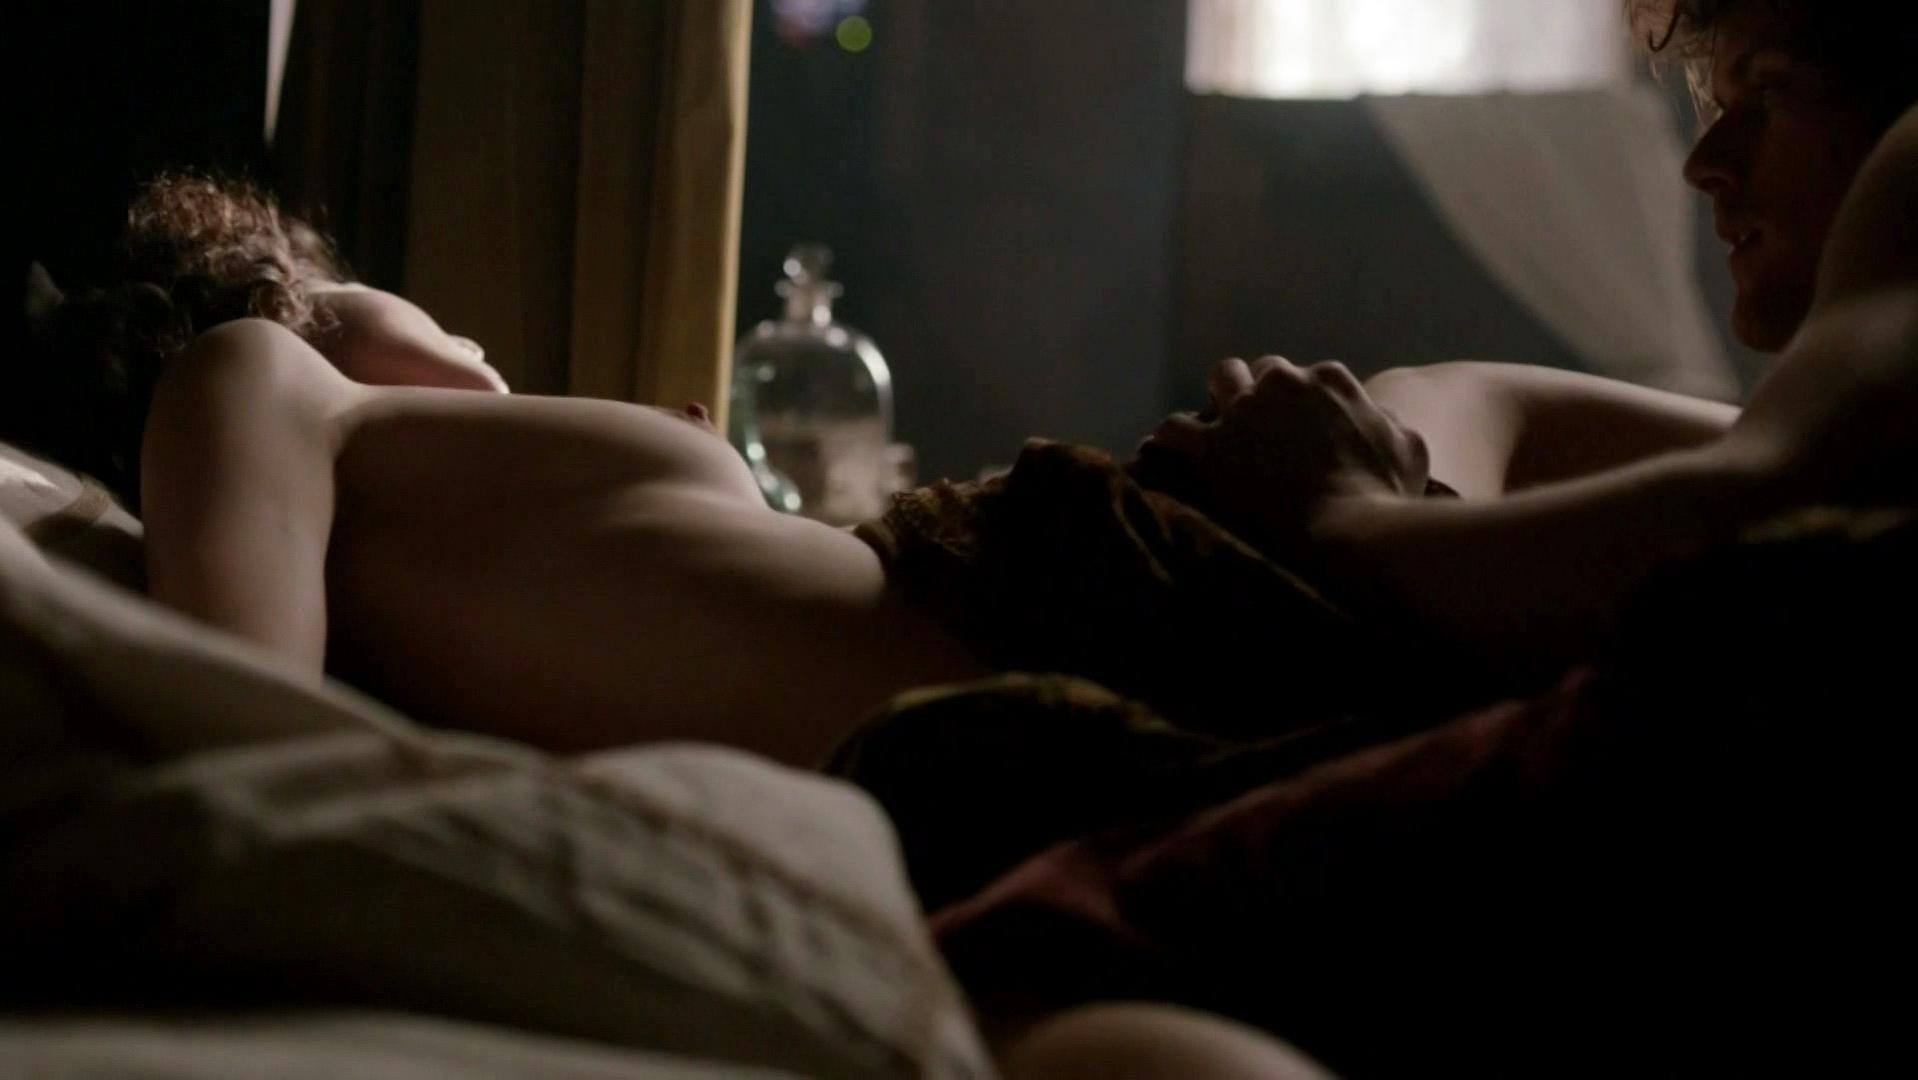 Caitriona Balfe nude - Outlander s01e10 (2015)